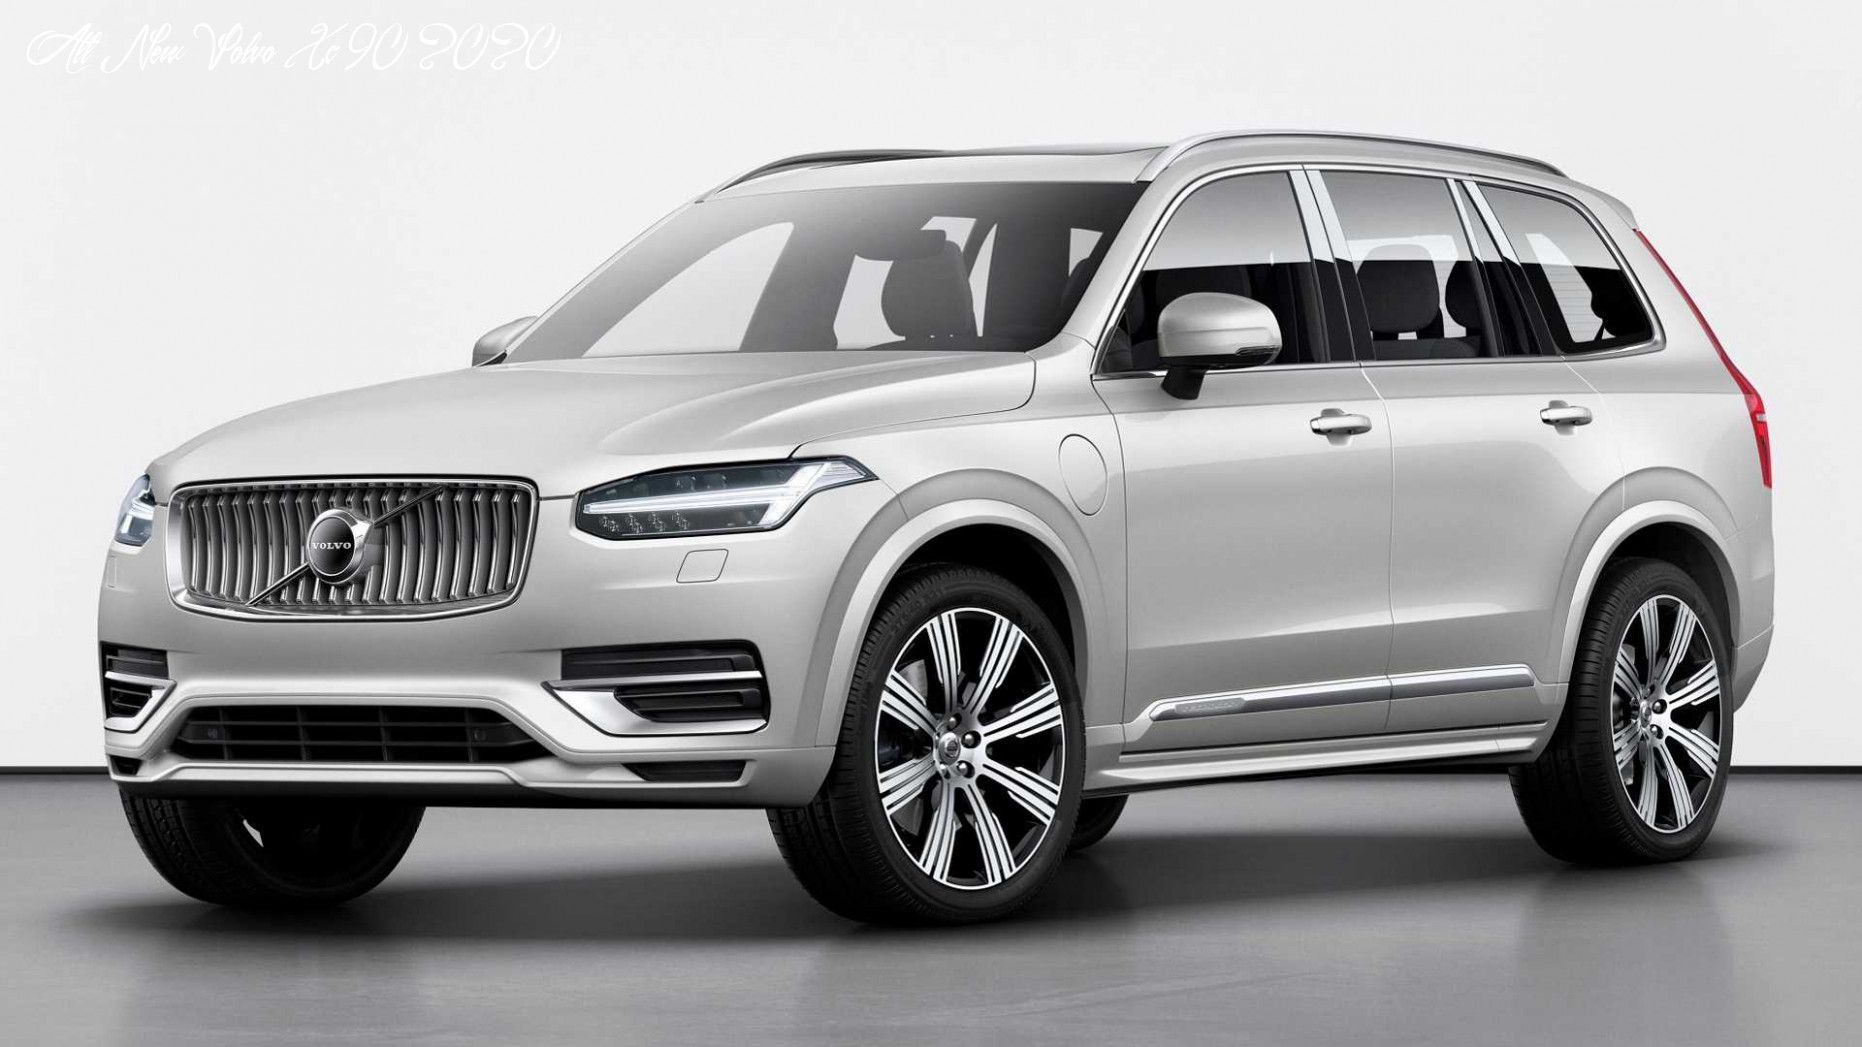 All New Volvo Xc90 2020 New Concept In 2020 Volvo Xc90 Volvo Suv Volvo Hybrid